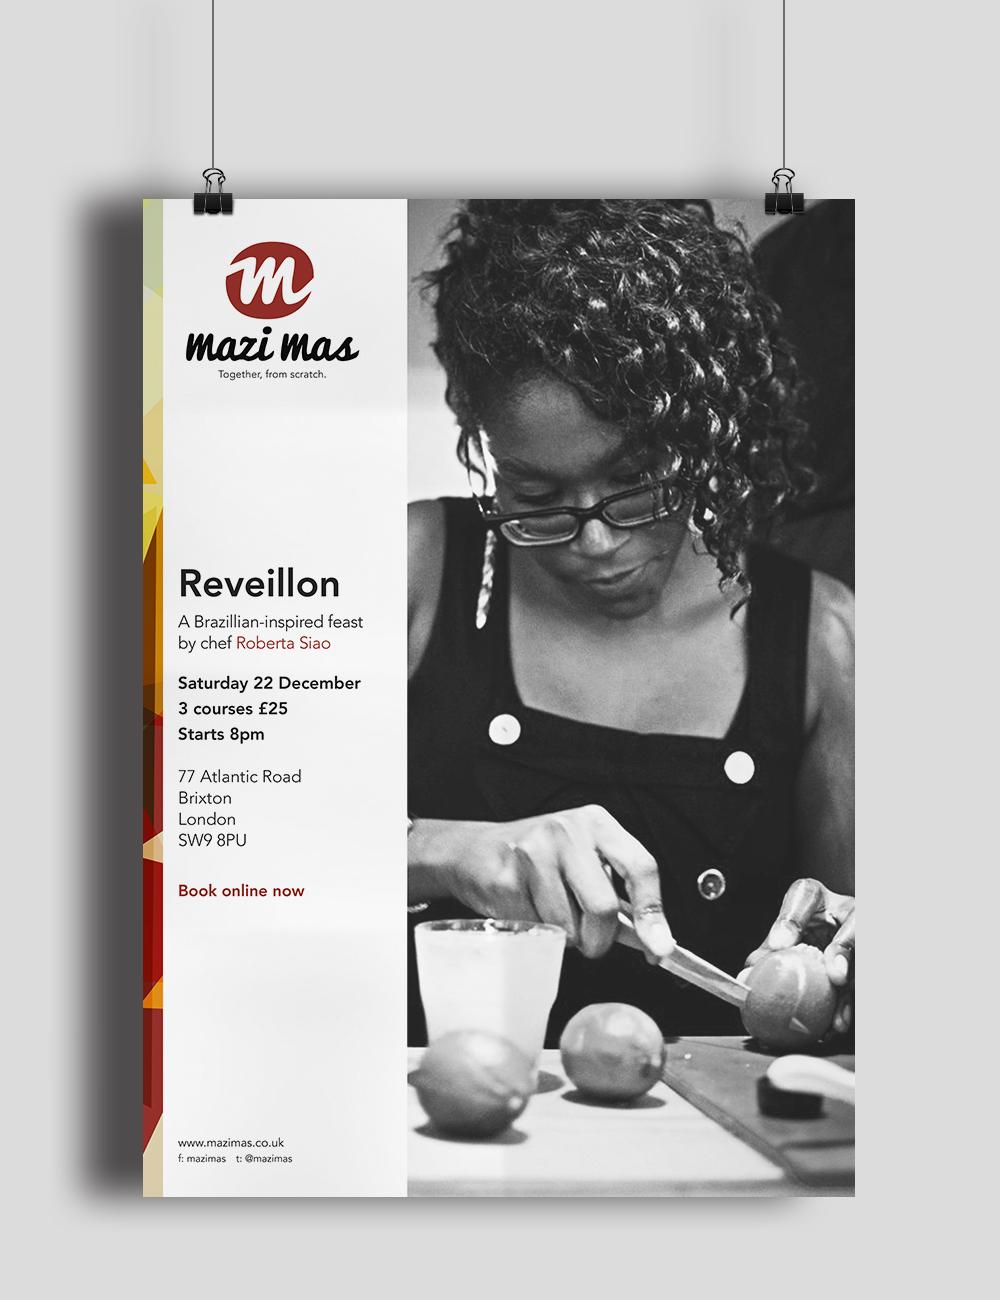 Martyna-Kramarczyk-Mazi Mas-Brand-poster design.jpg